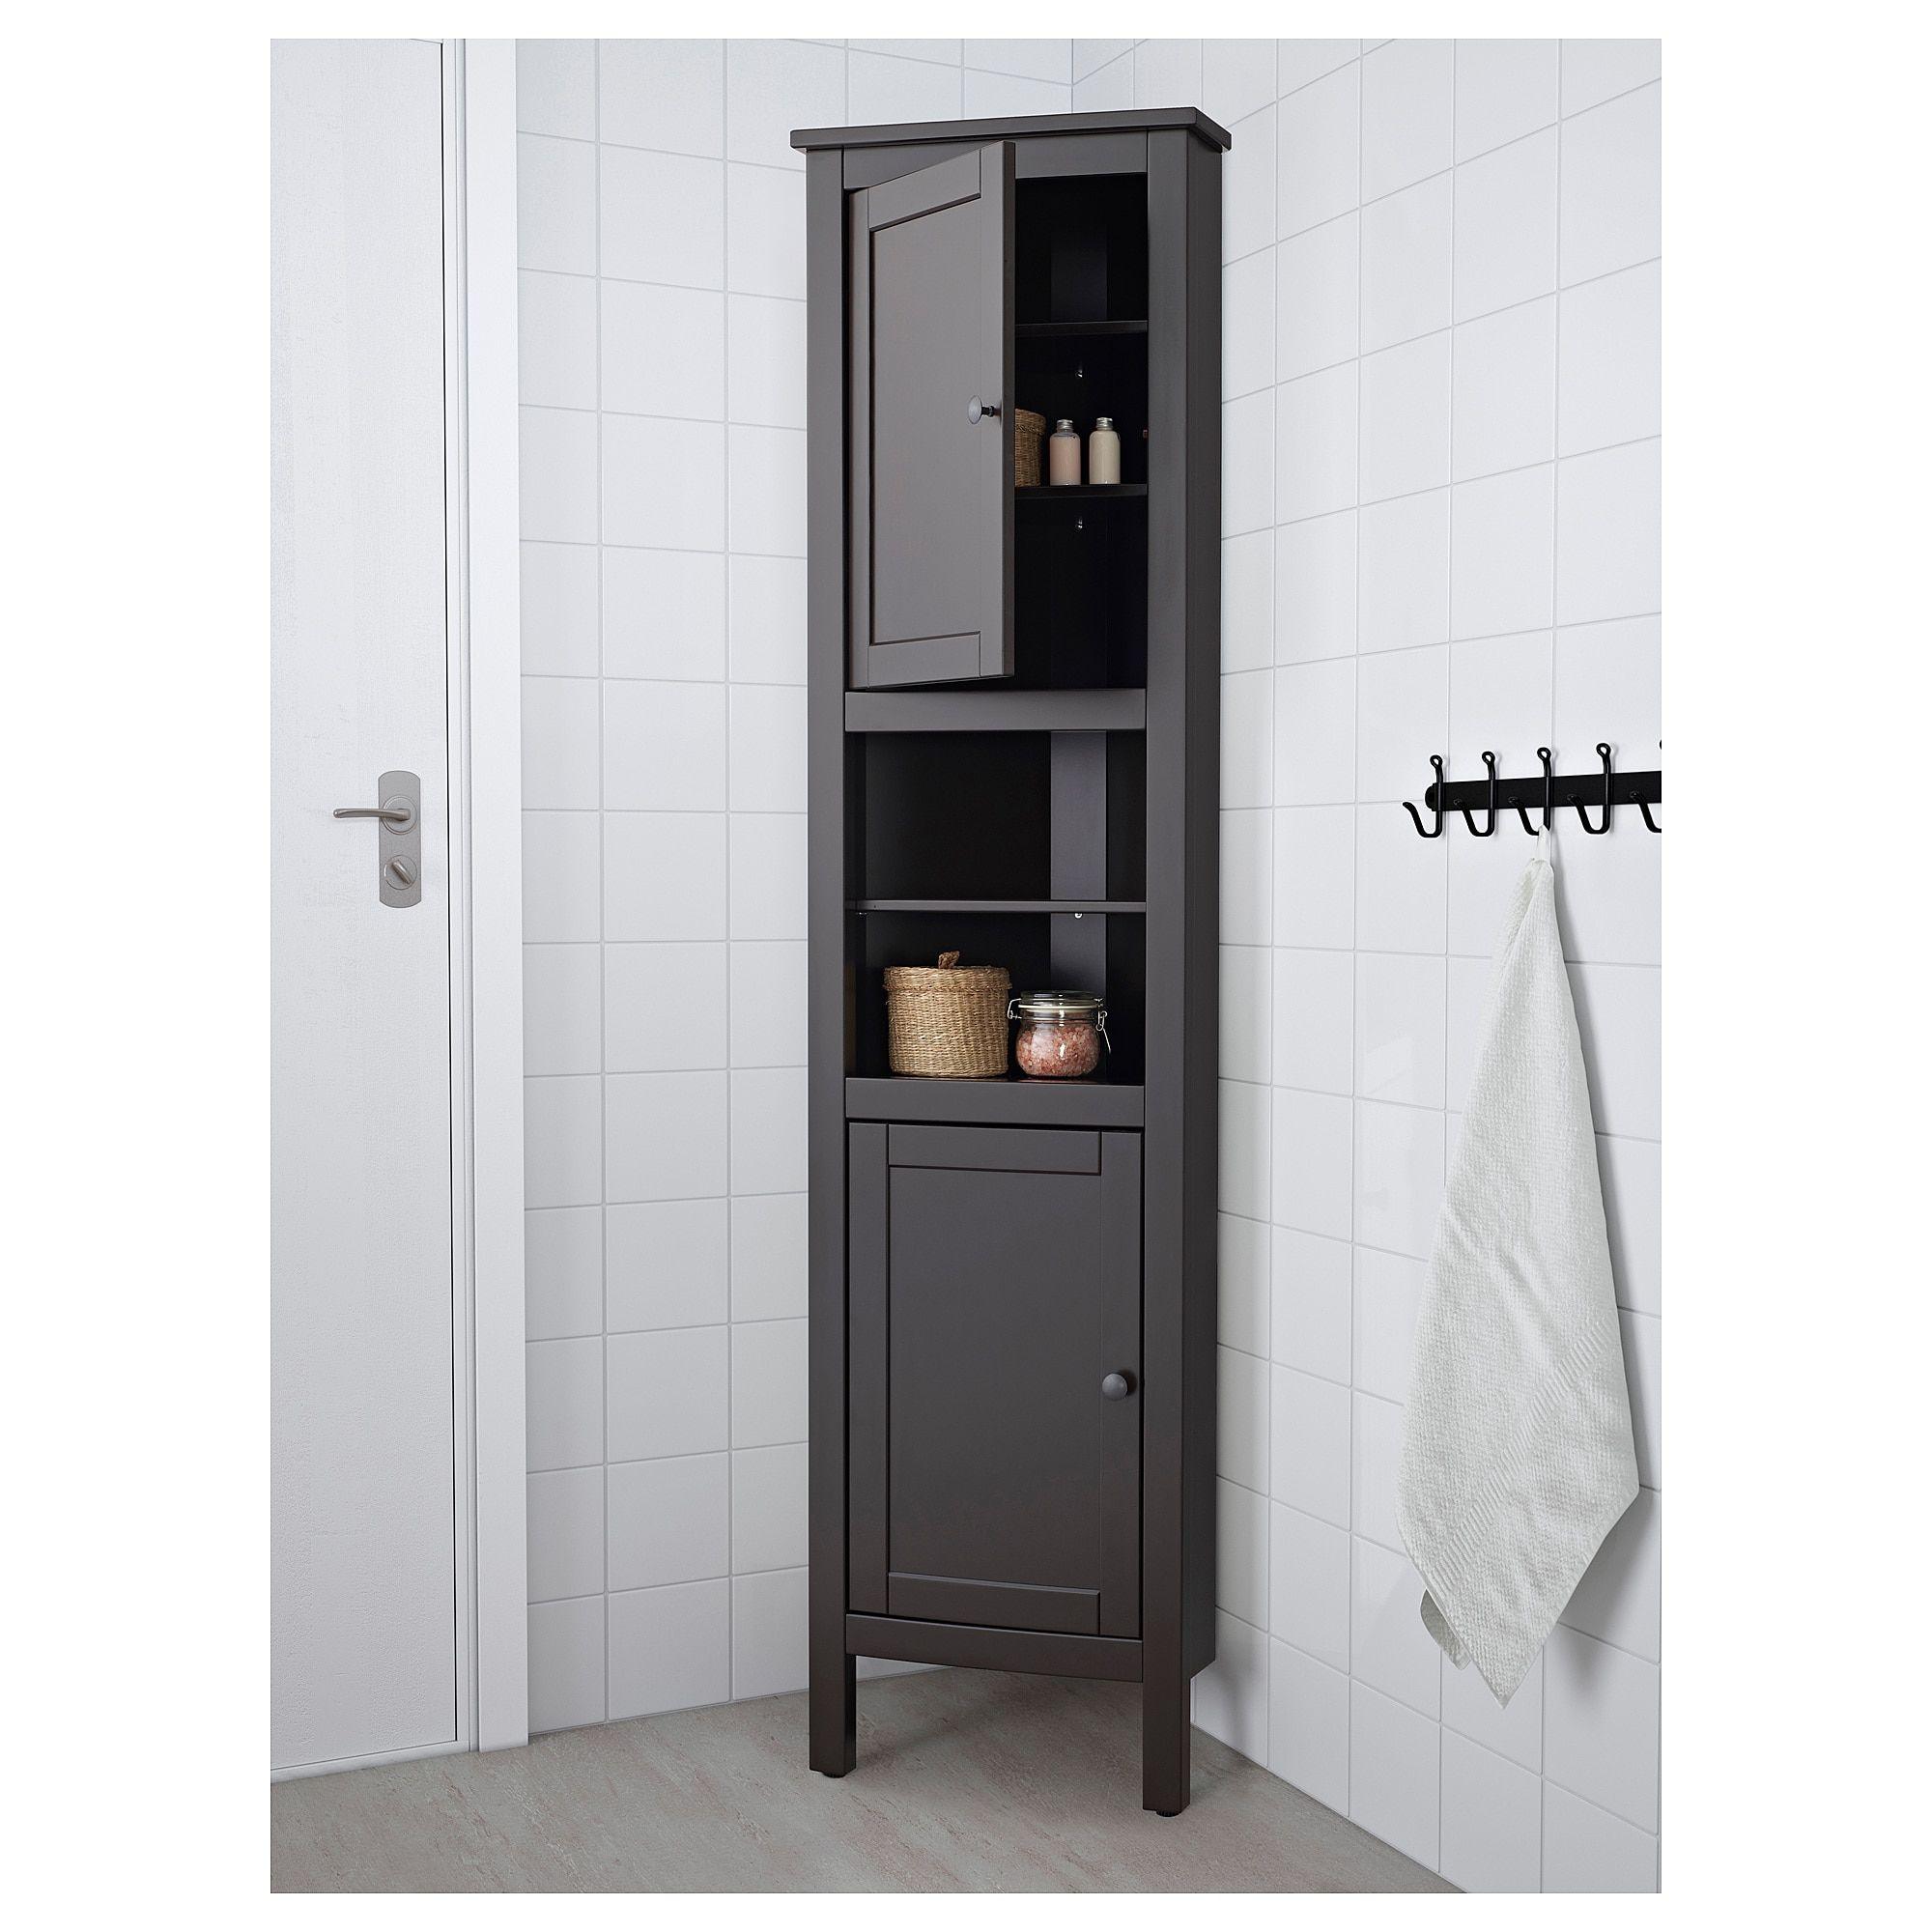 Hemnes Corner Cabinet Black Brown 20 1 2x14 5 8x78 3 8